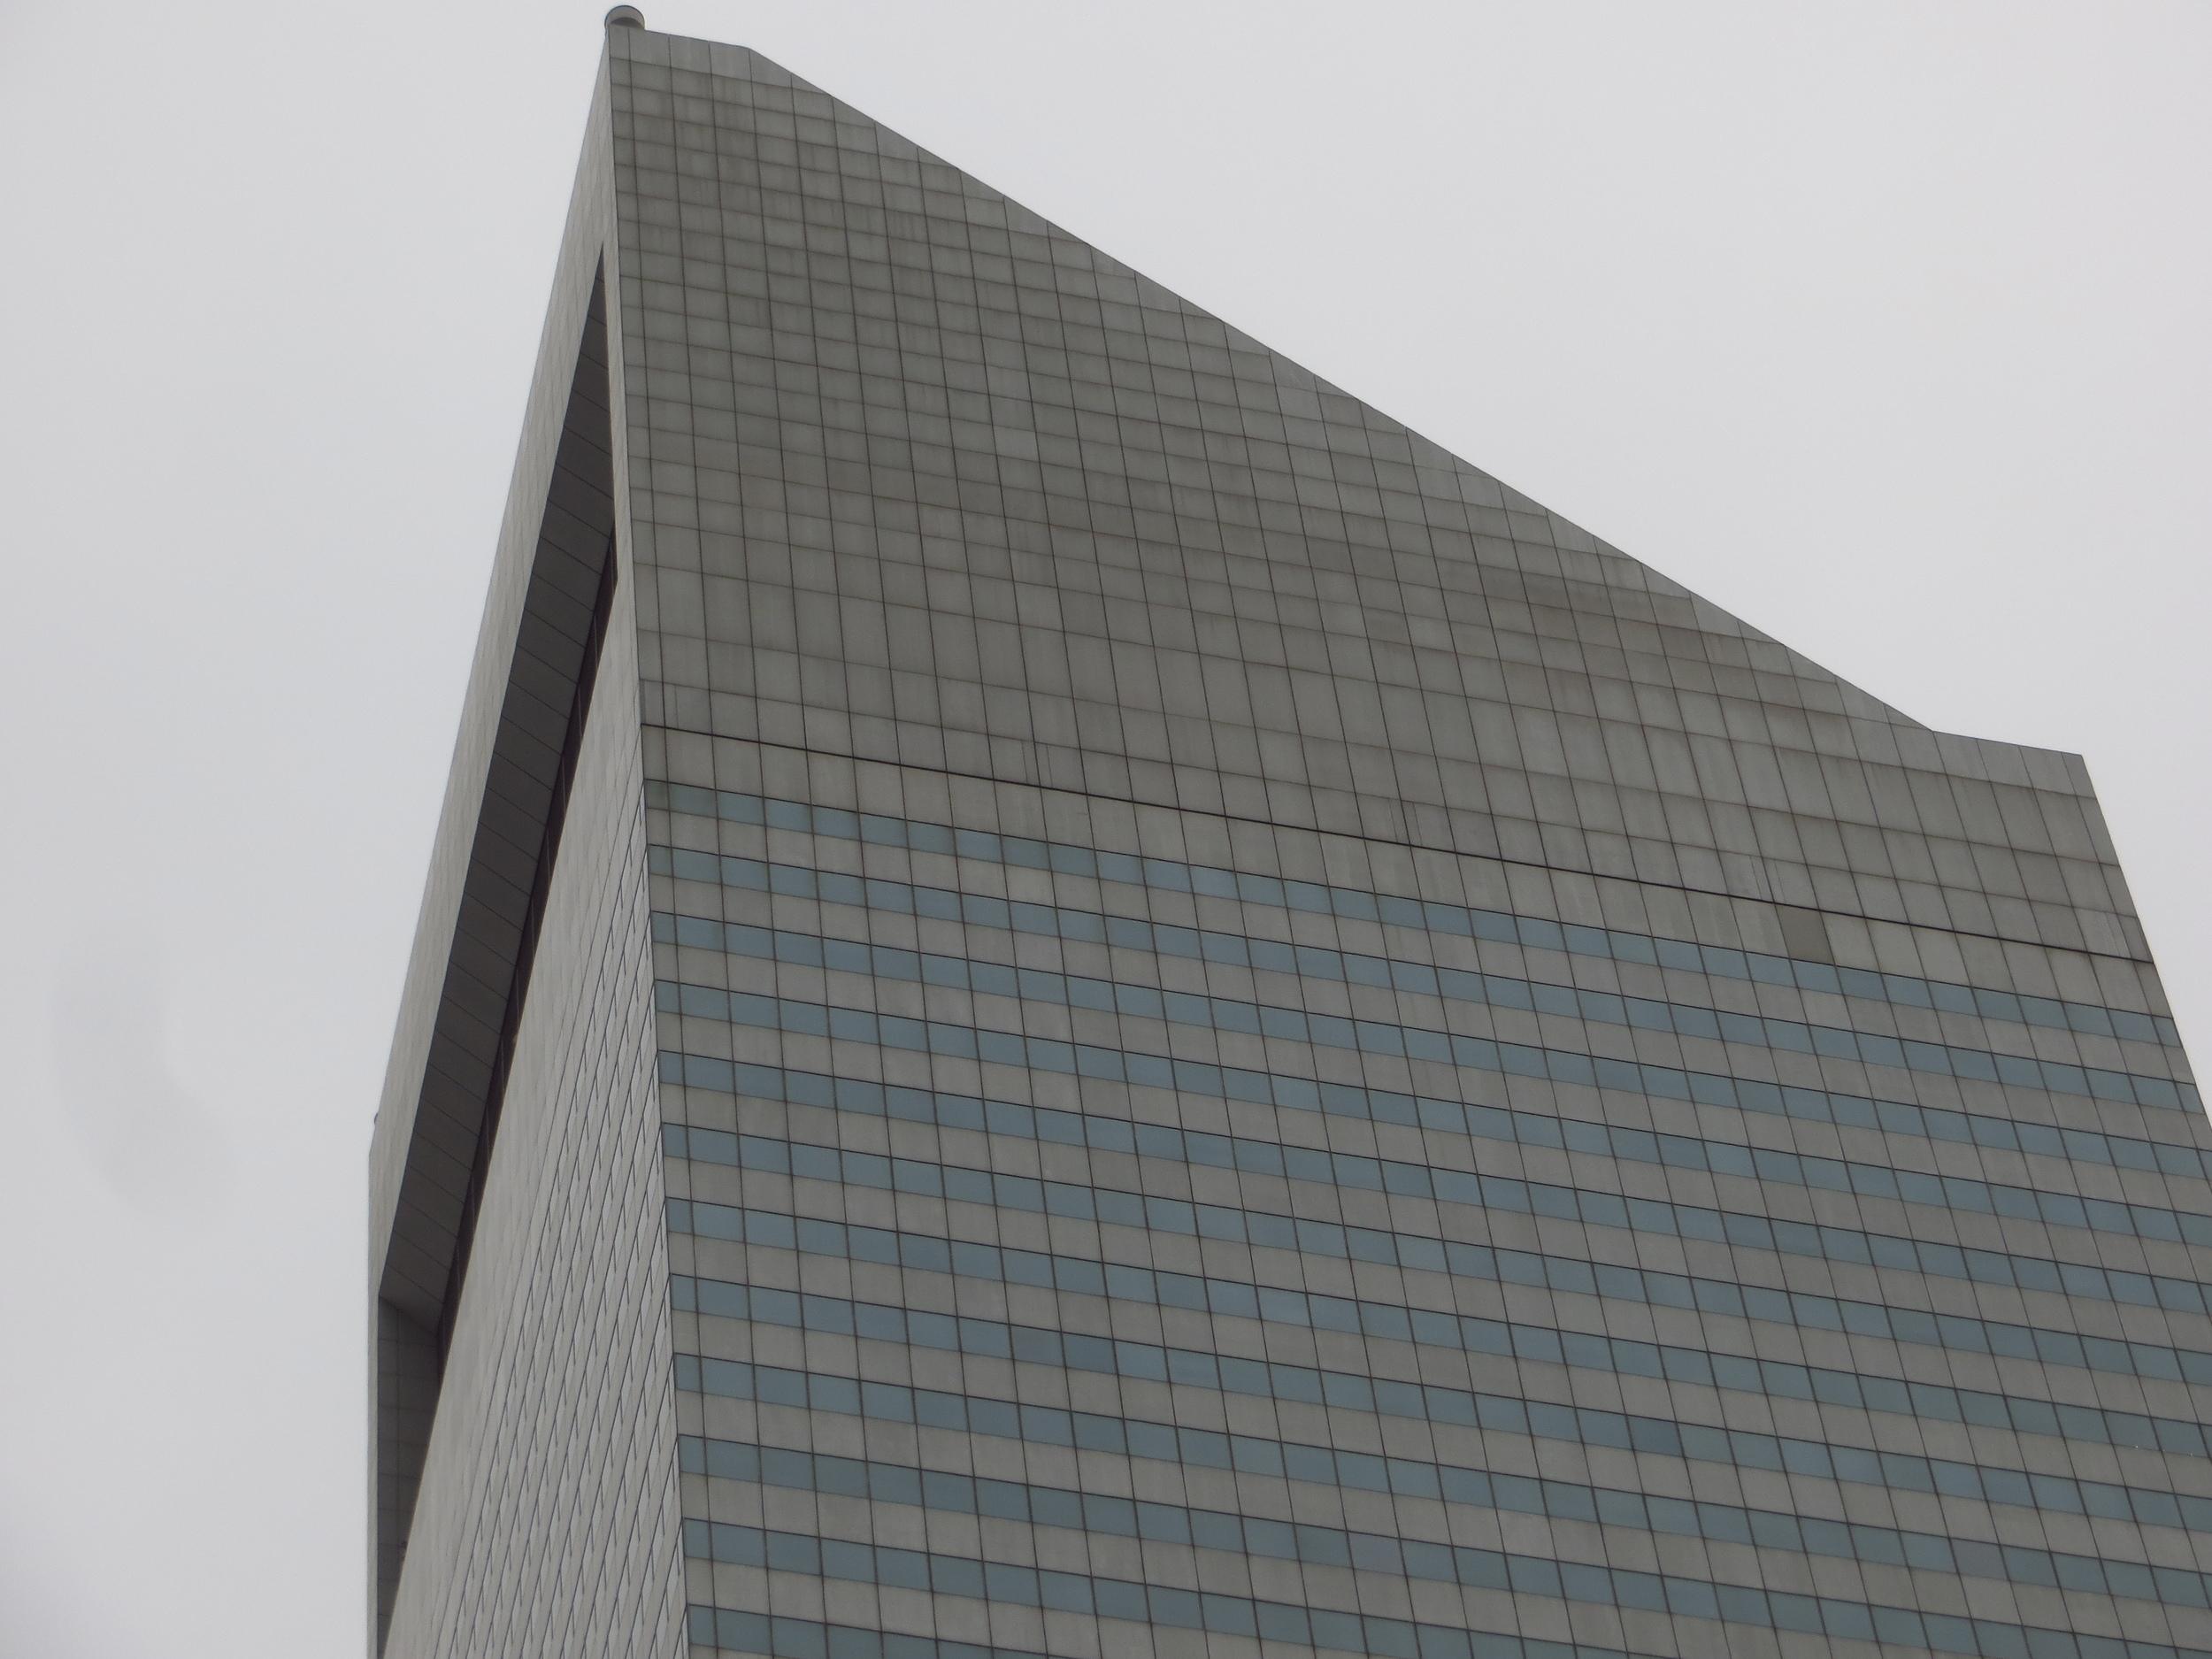 Top of Citigroup Center